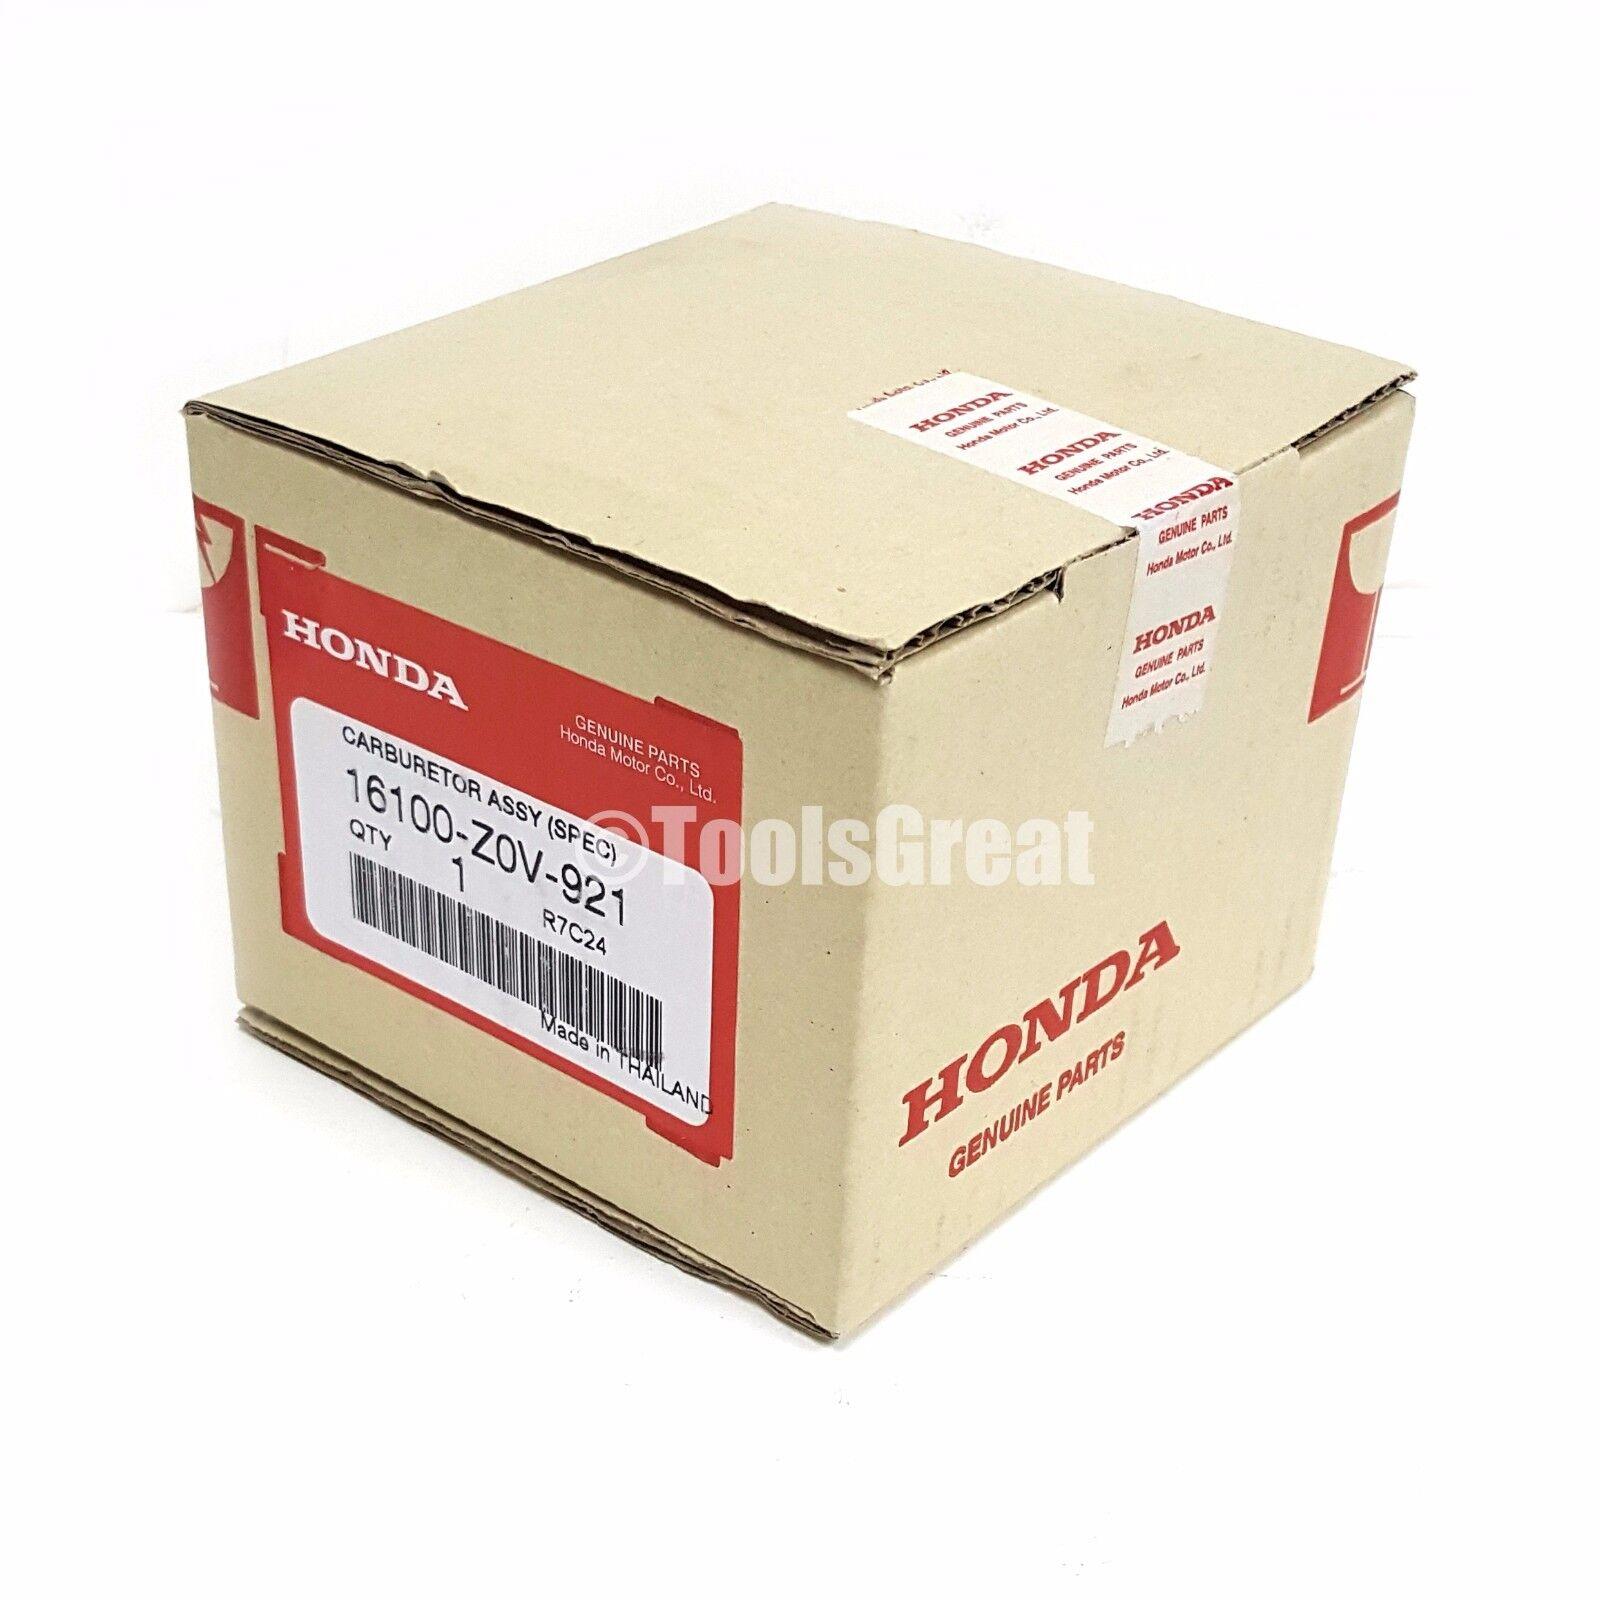 Genuine Honda Motor 16100-Z0V-921 GX200 6.5hp Cochebureator CocheB GX 200